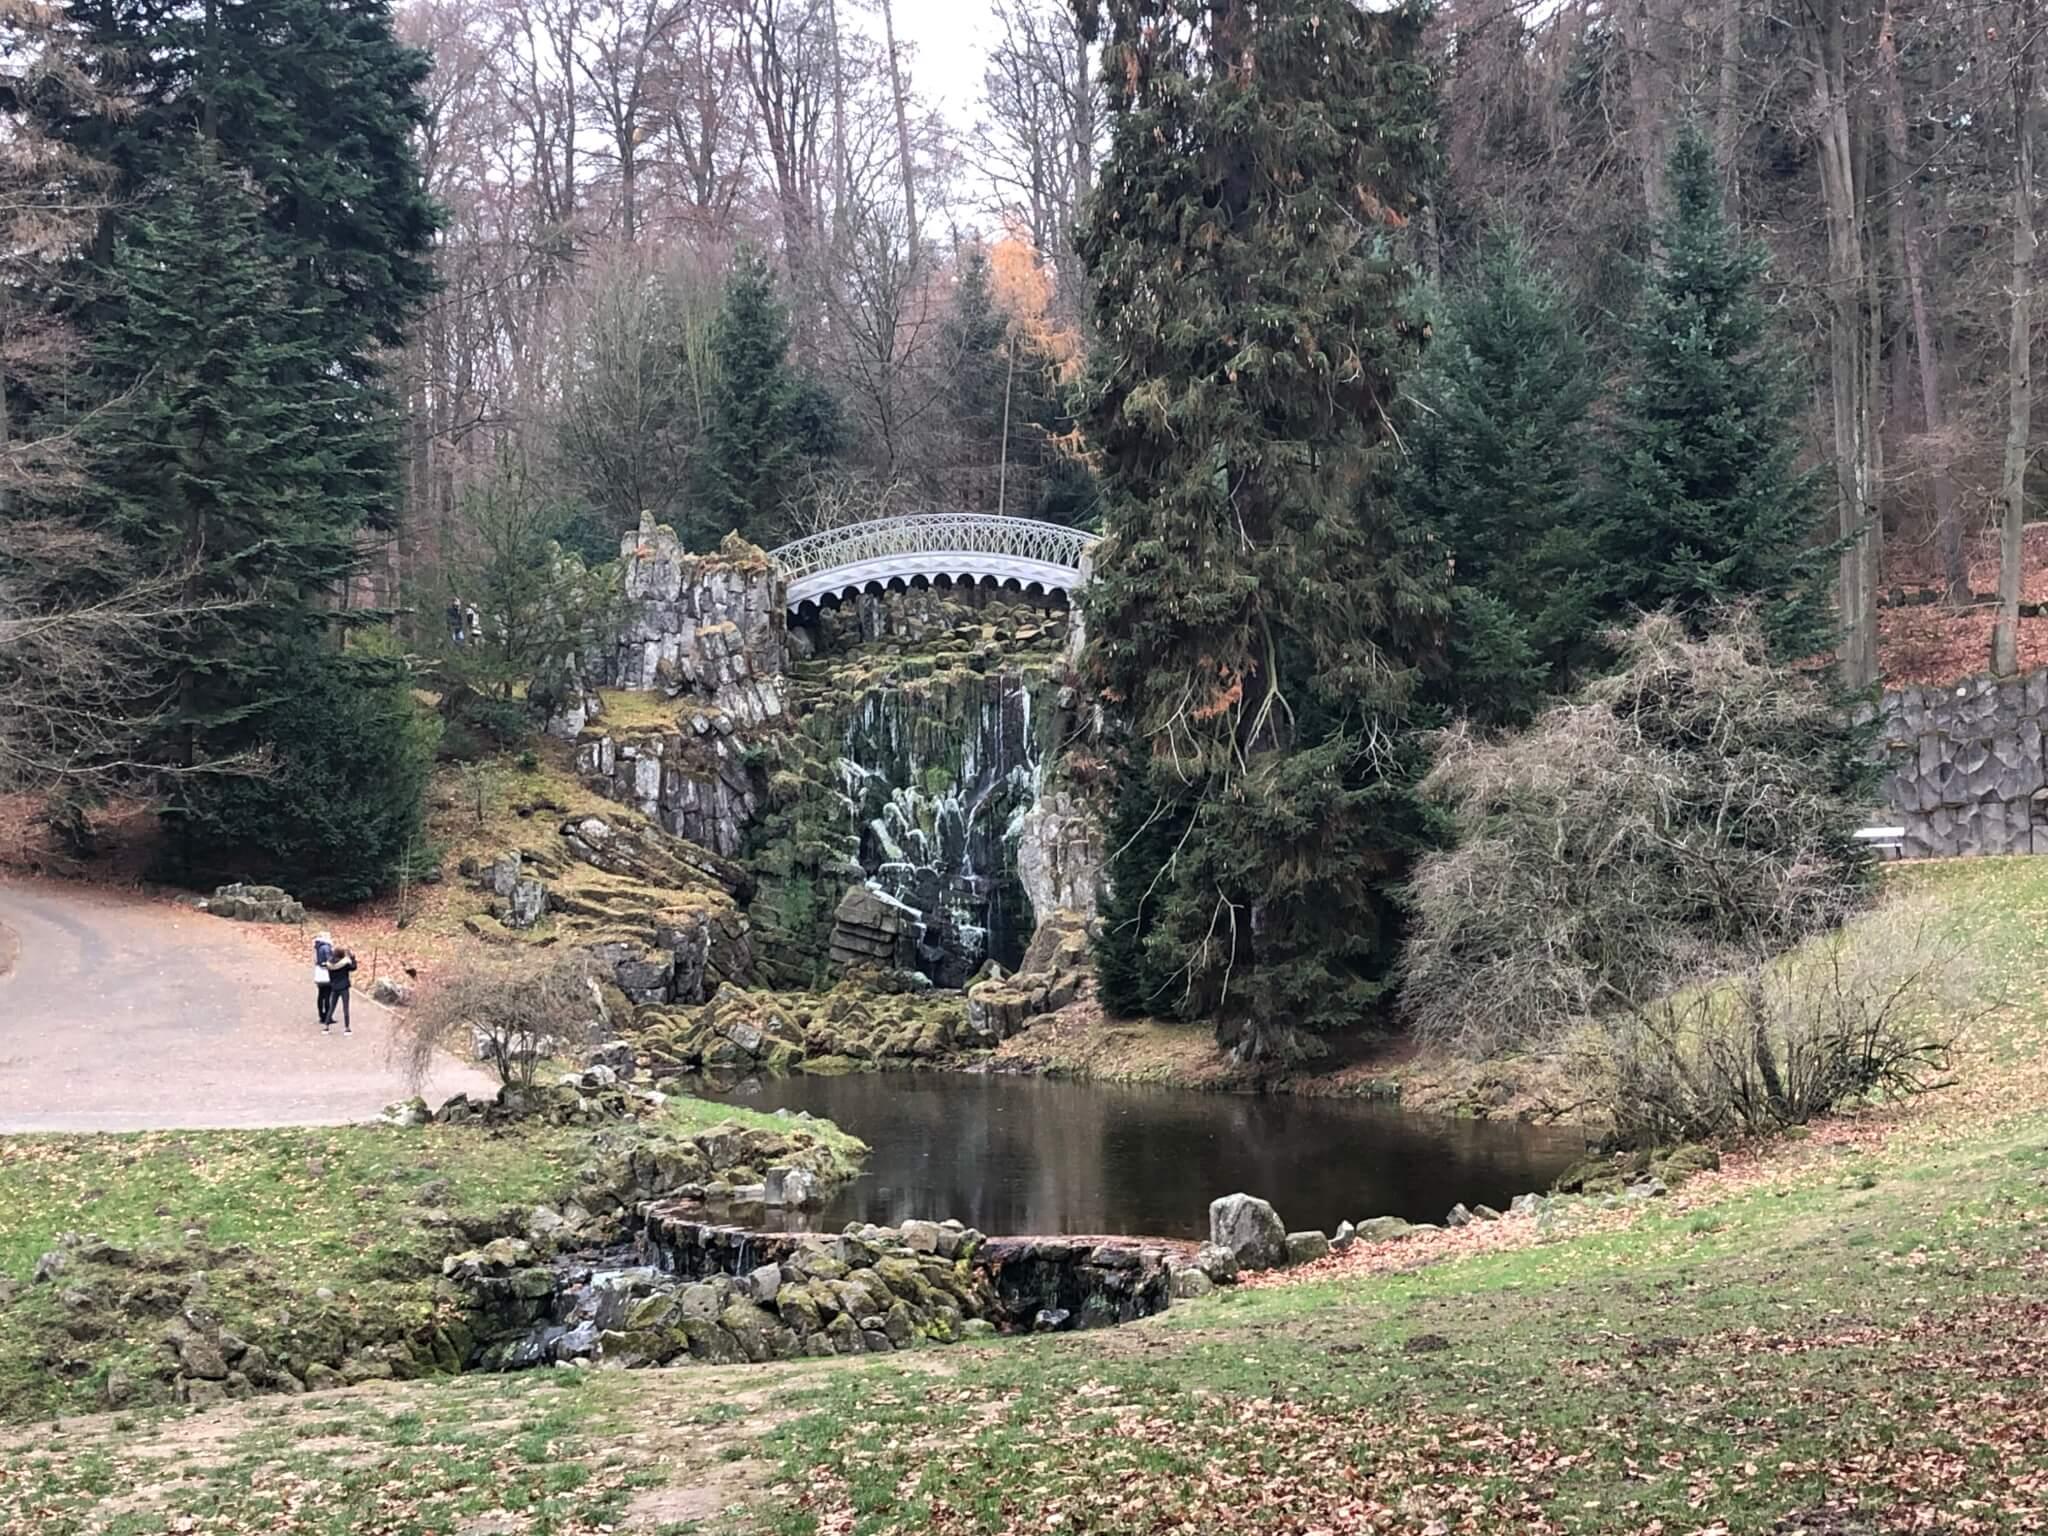 Teufelsbrücke, Bergpark Wilhelmshöhe, Kassel